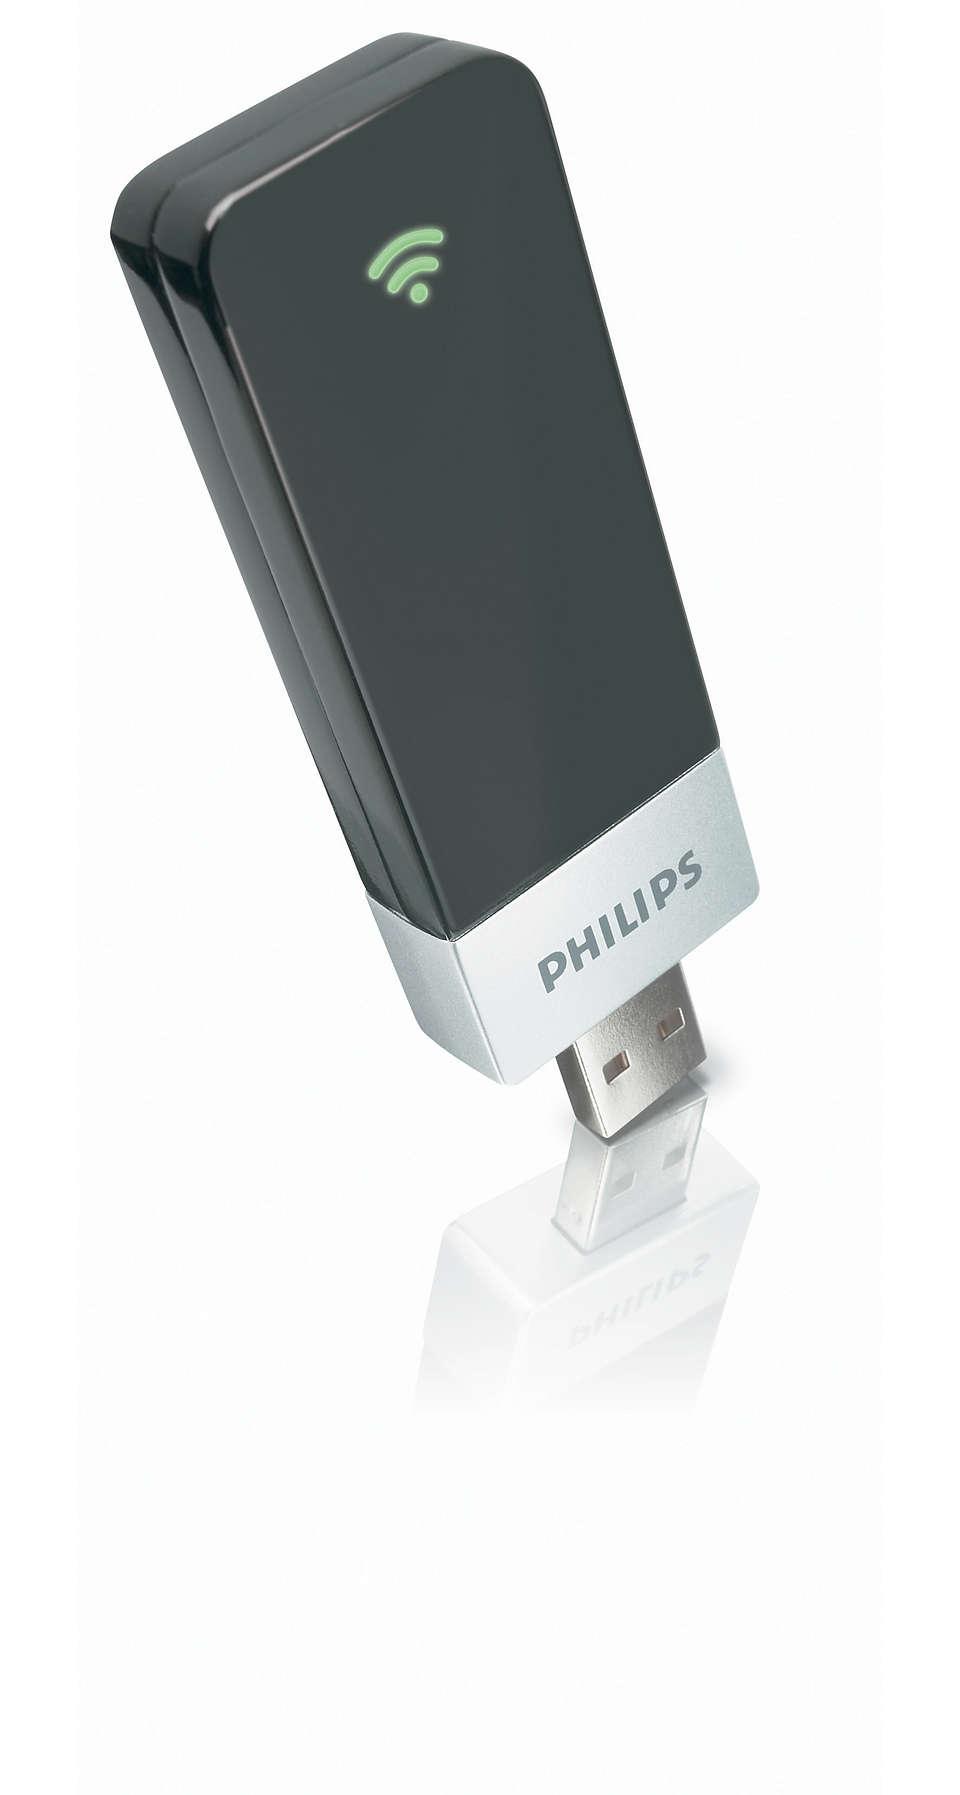 Adaptateur USB sans fil